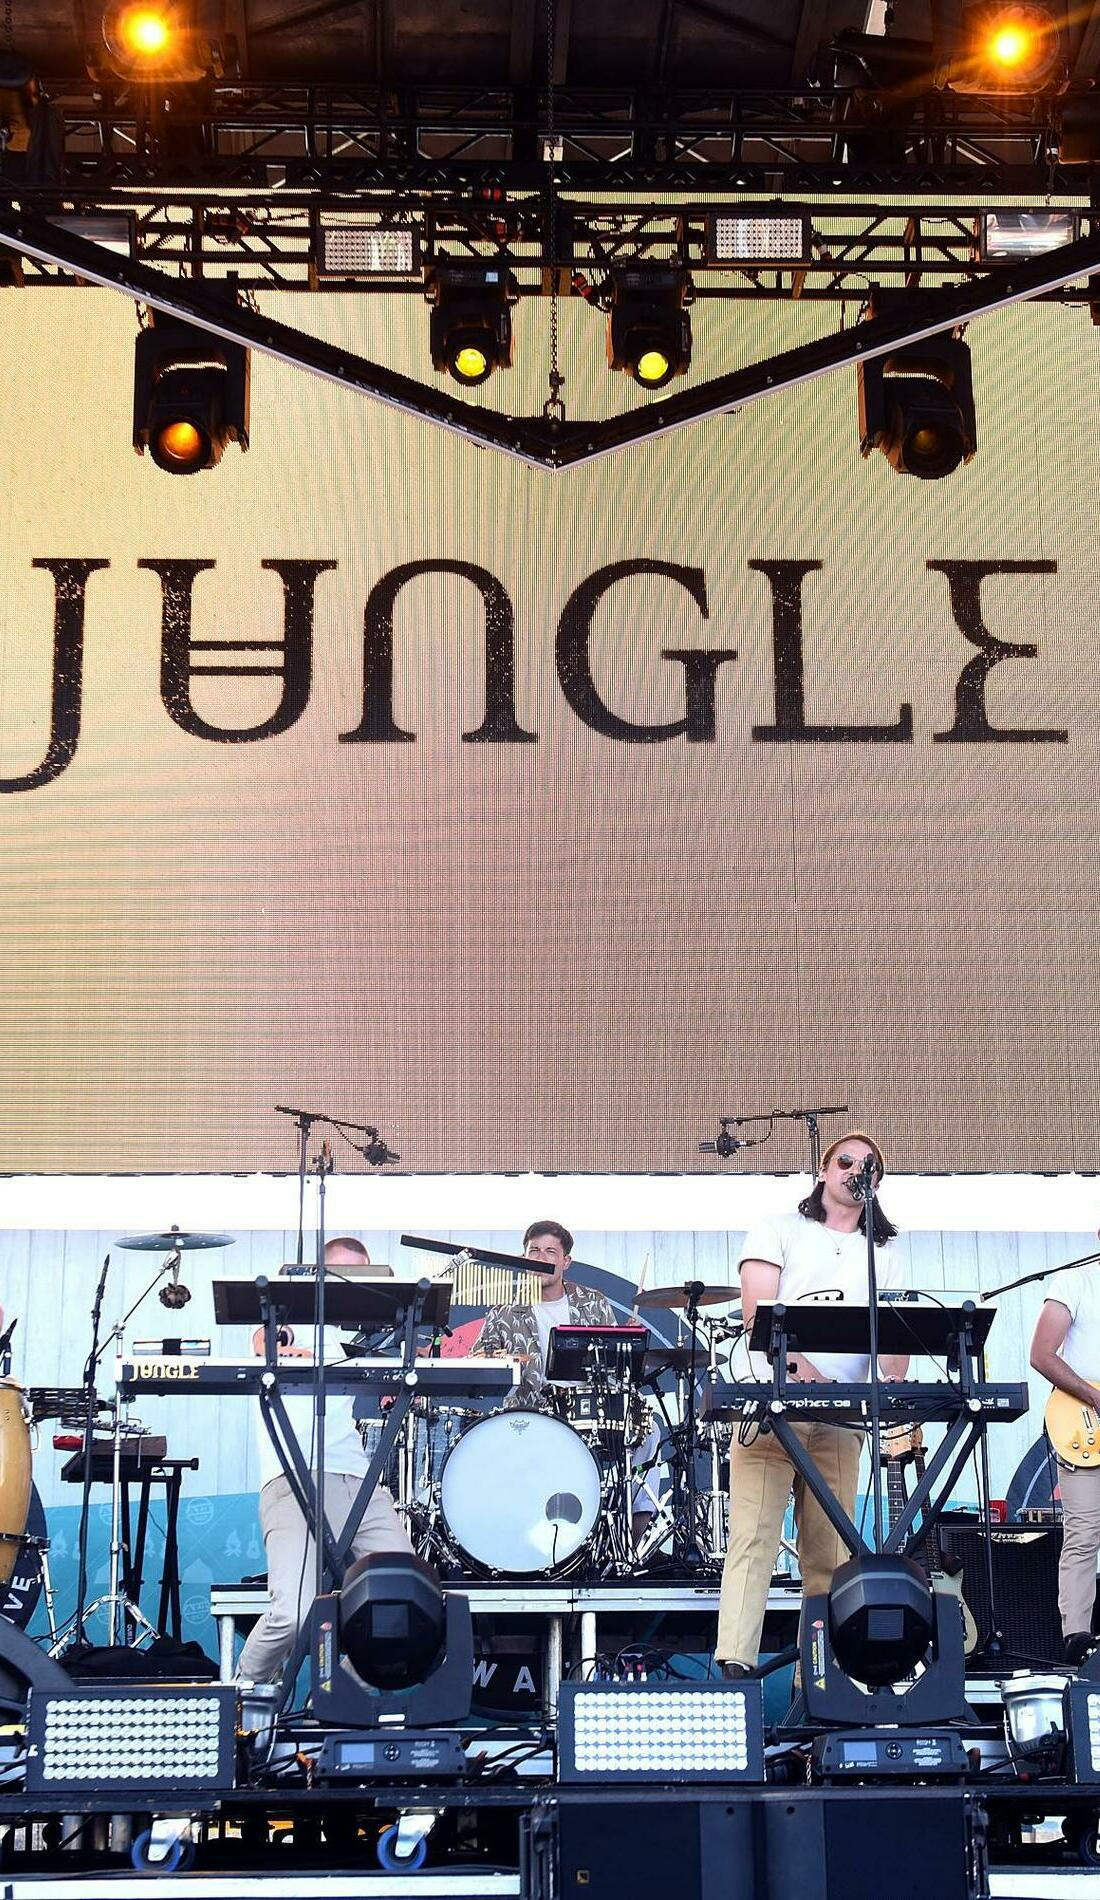 A Jungle live event